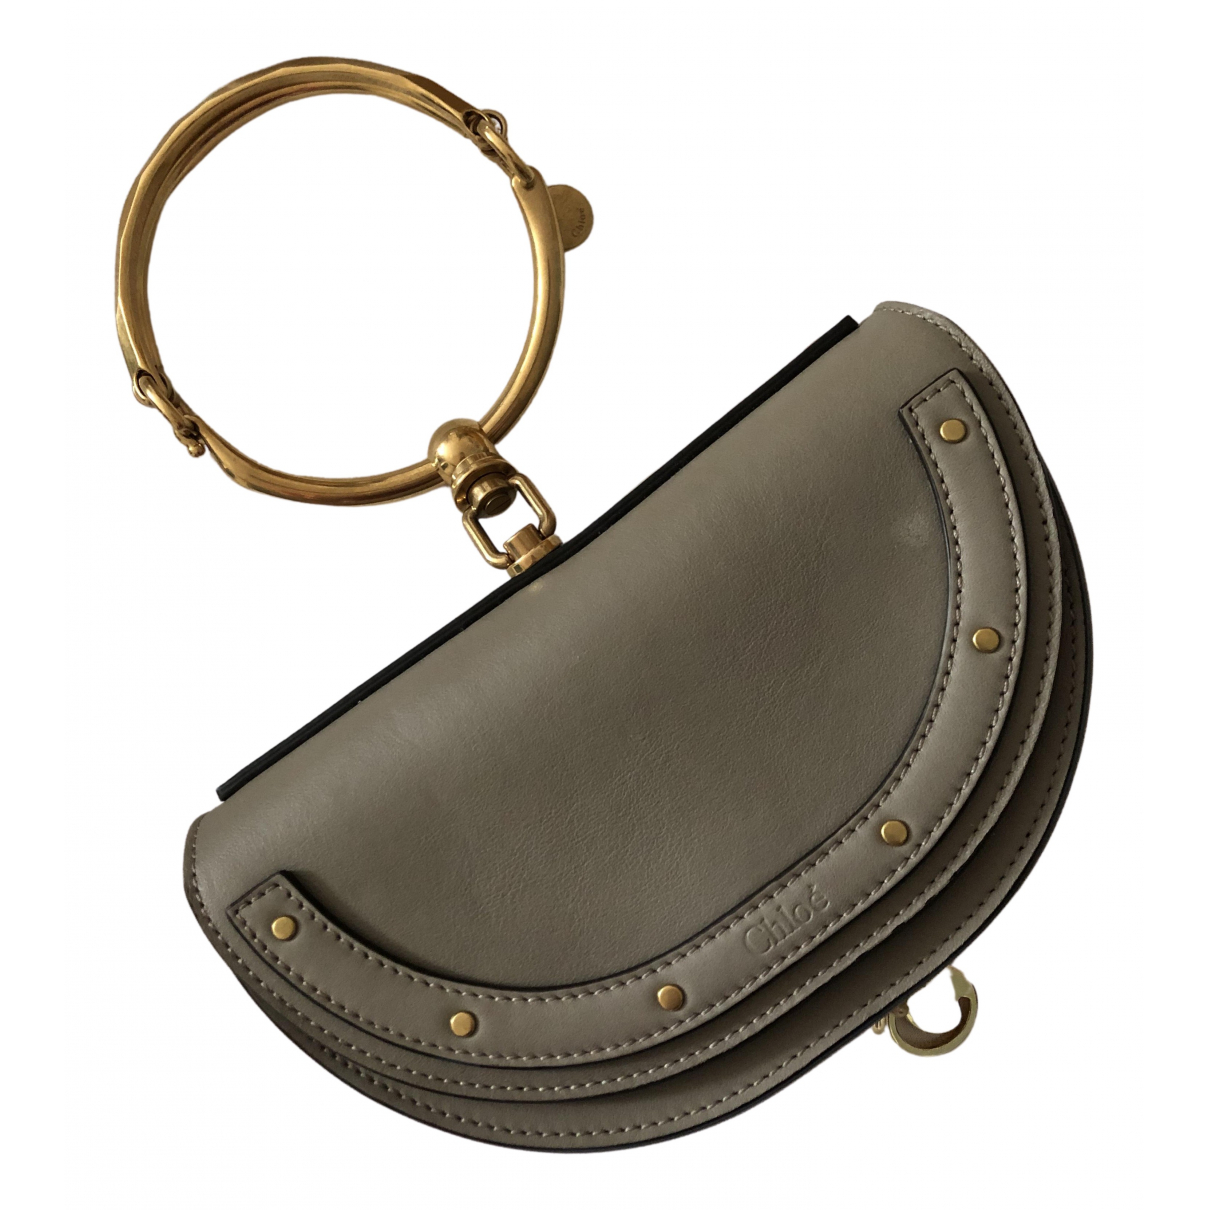 Pochette Bracelet Nile de Cuero Chloe